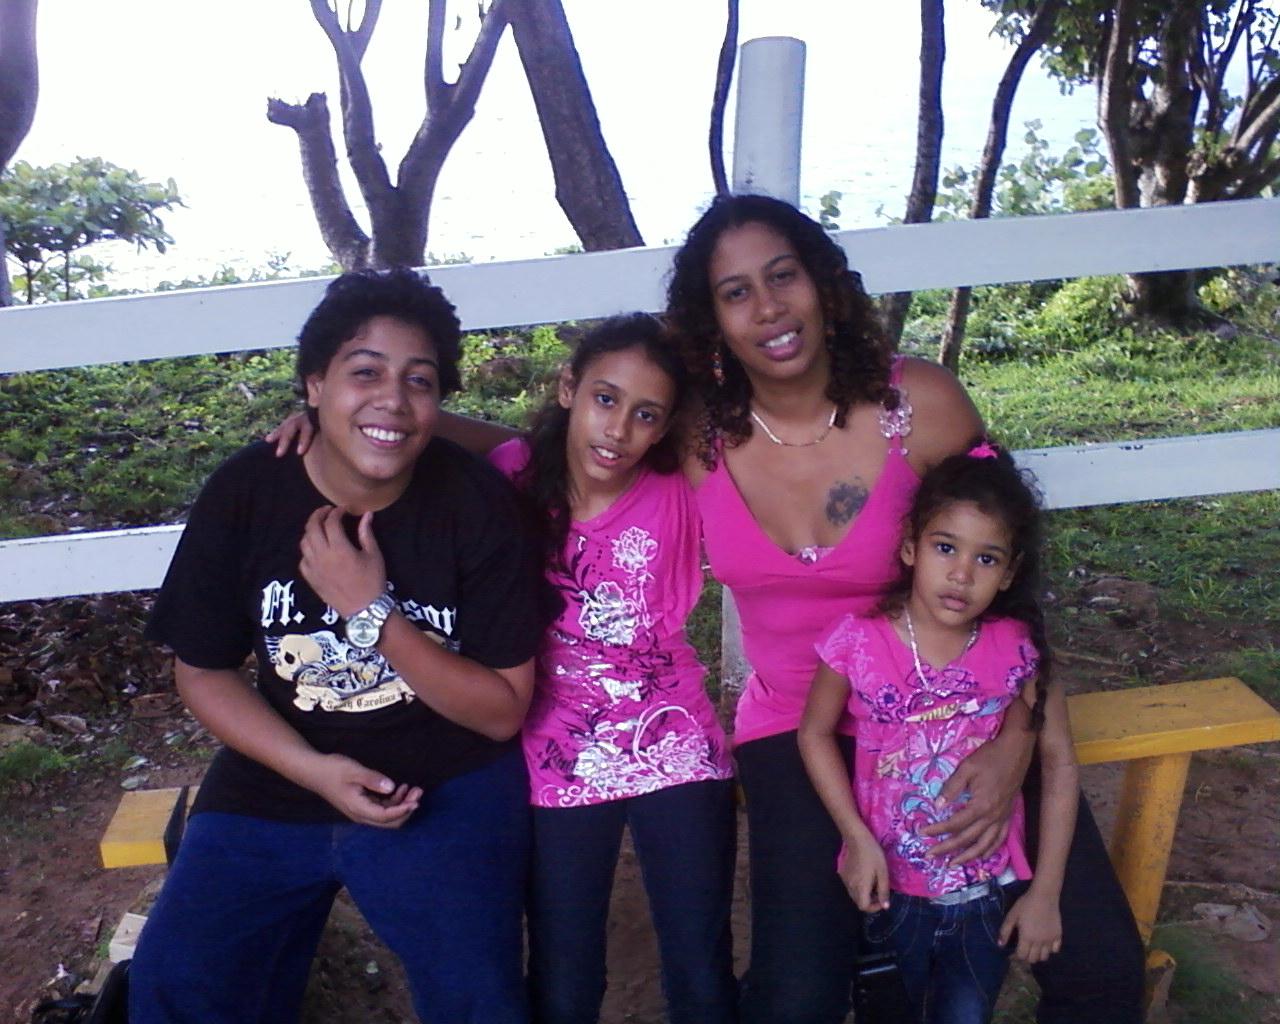 Madre Soltera Luchadoras: Mayo 2010